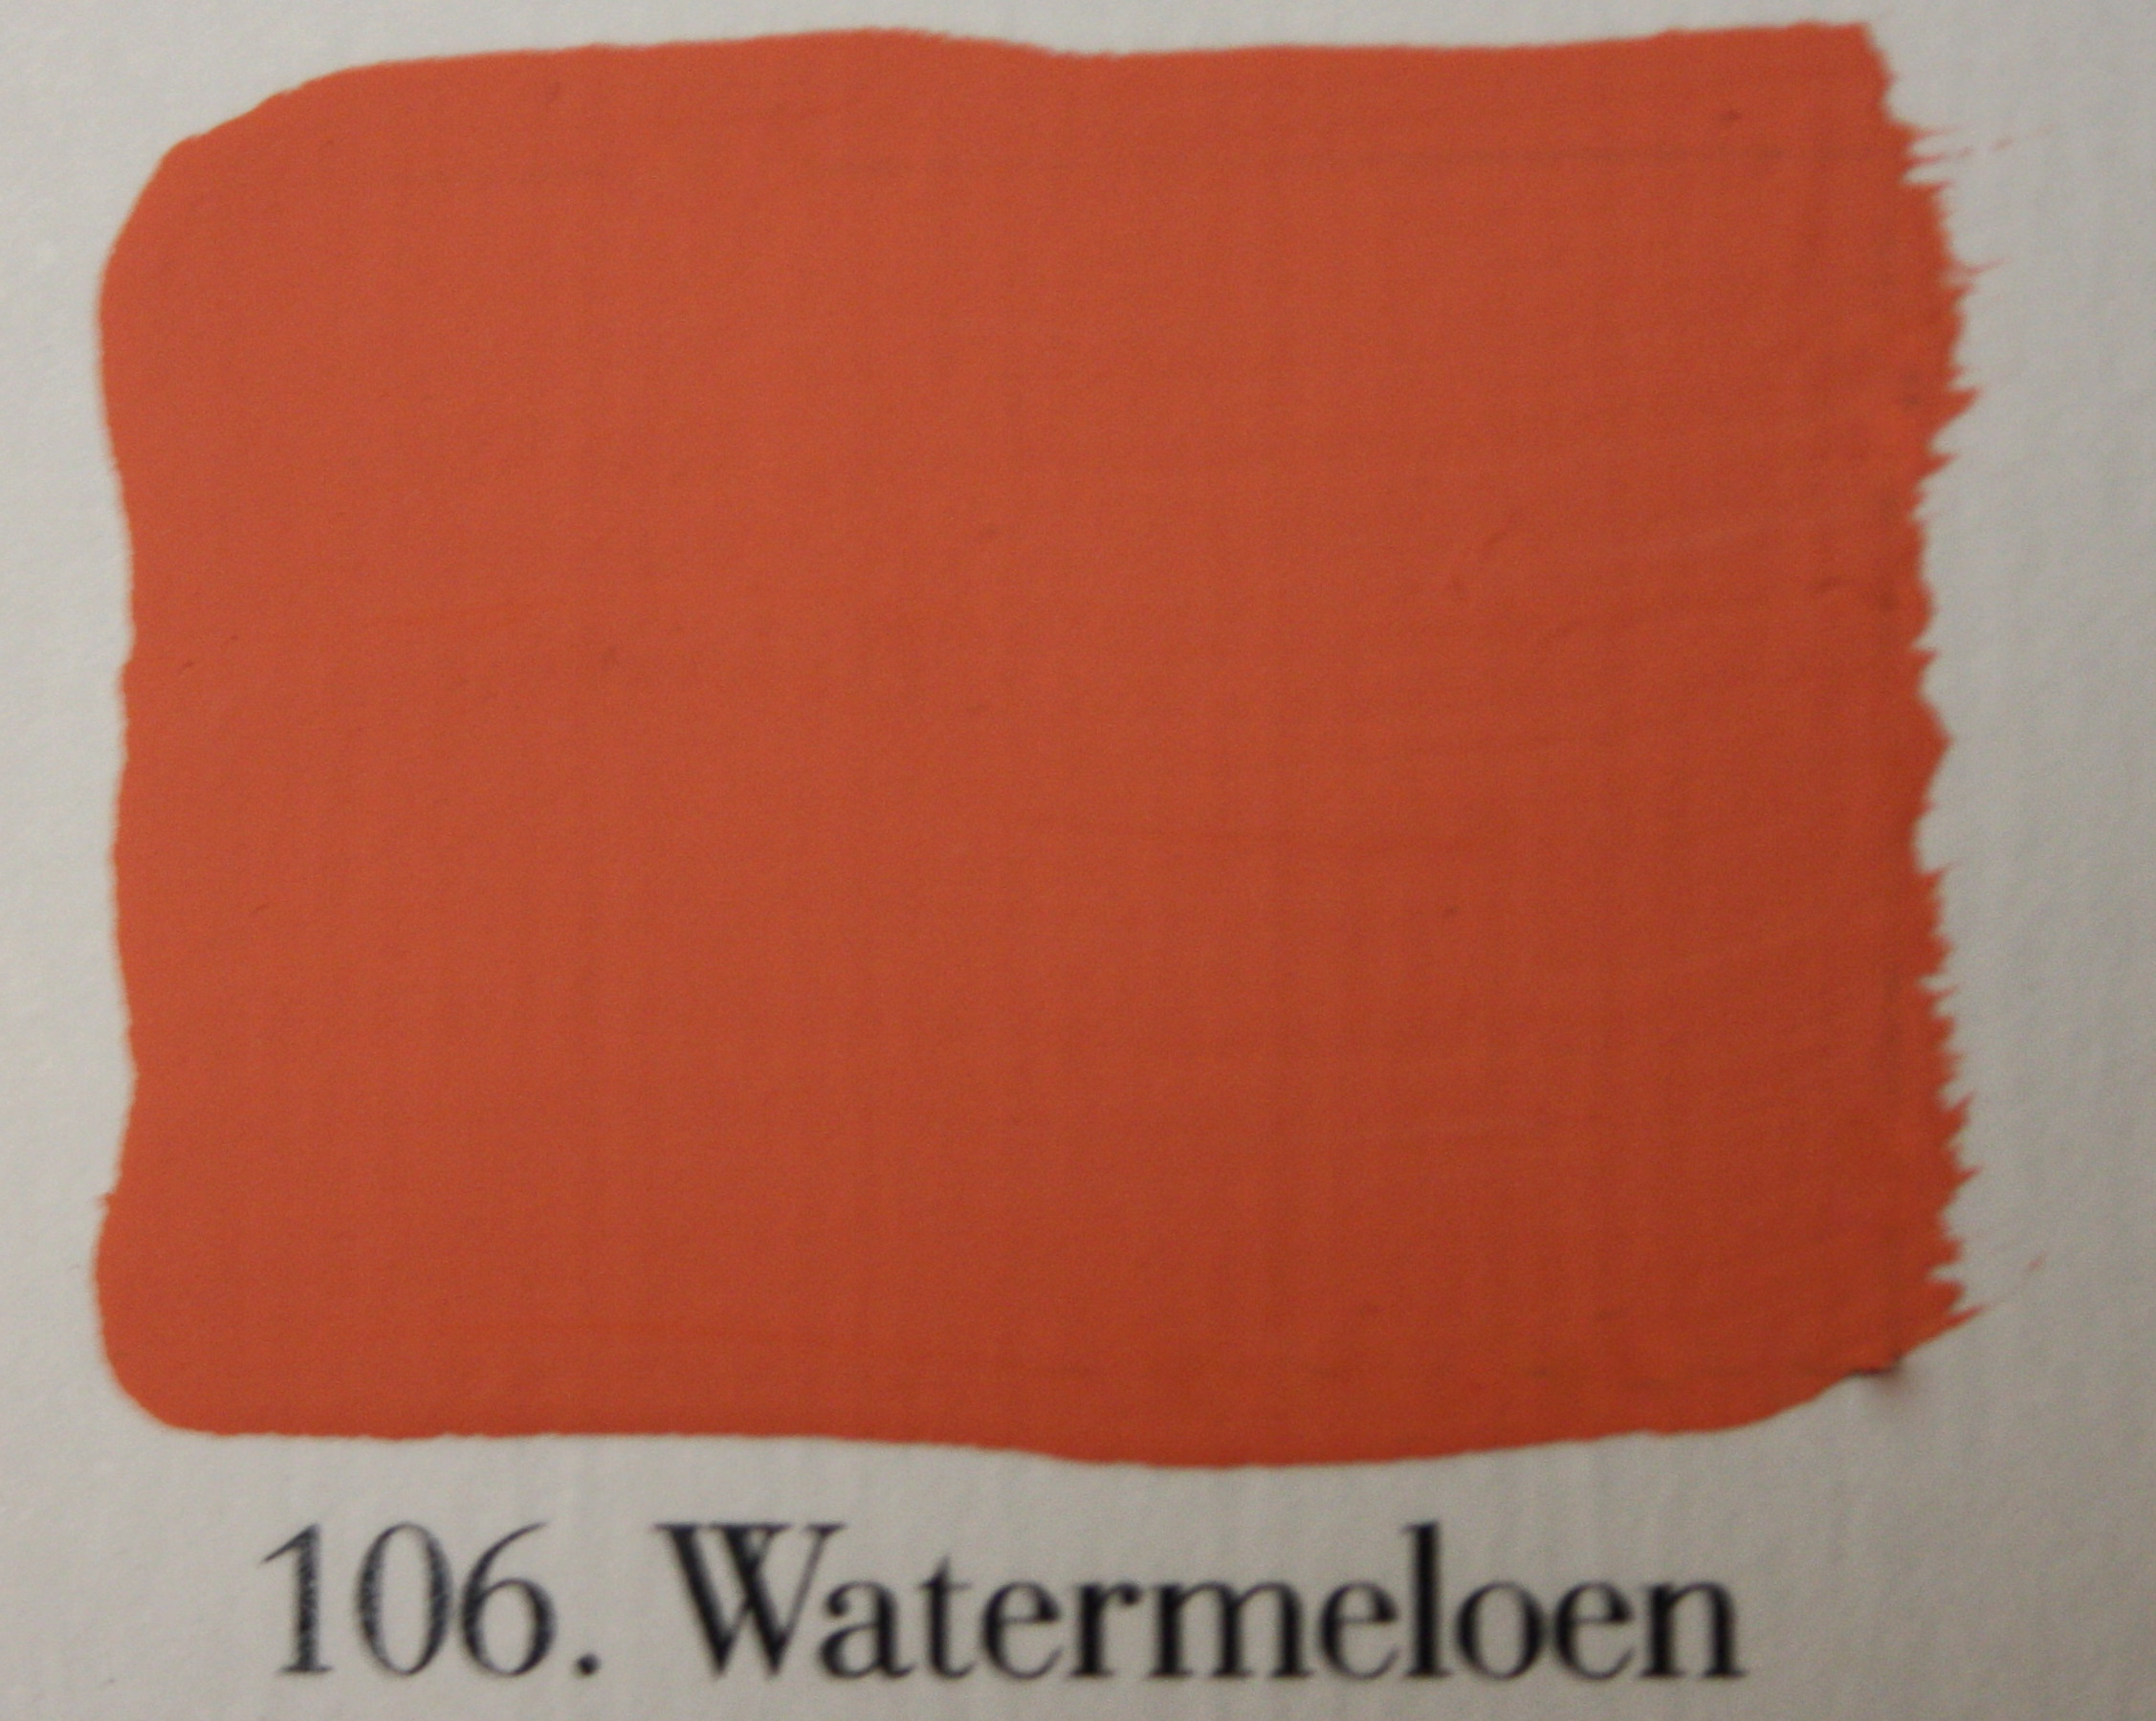 'l Authentique krijtverf 106. Watermeloen